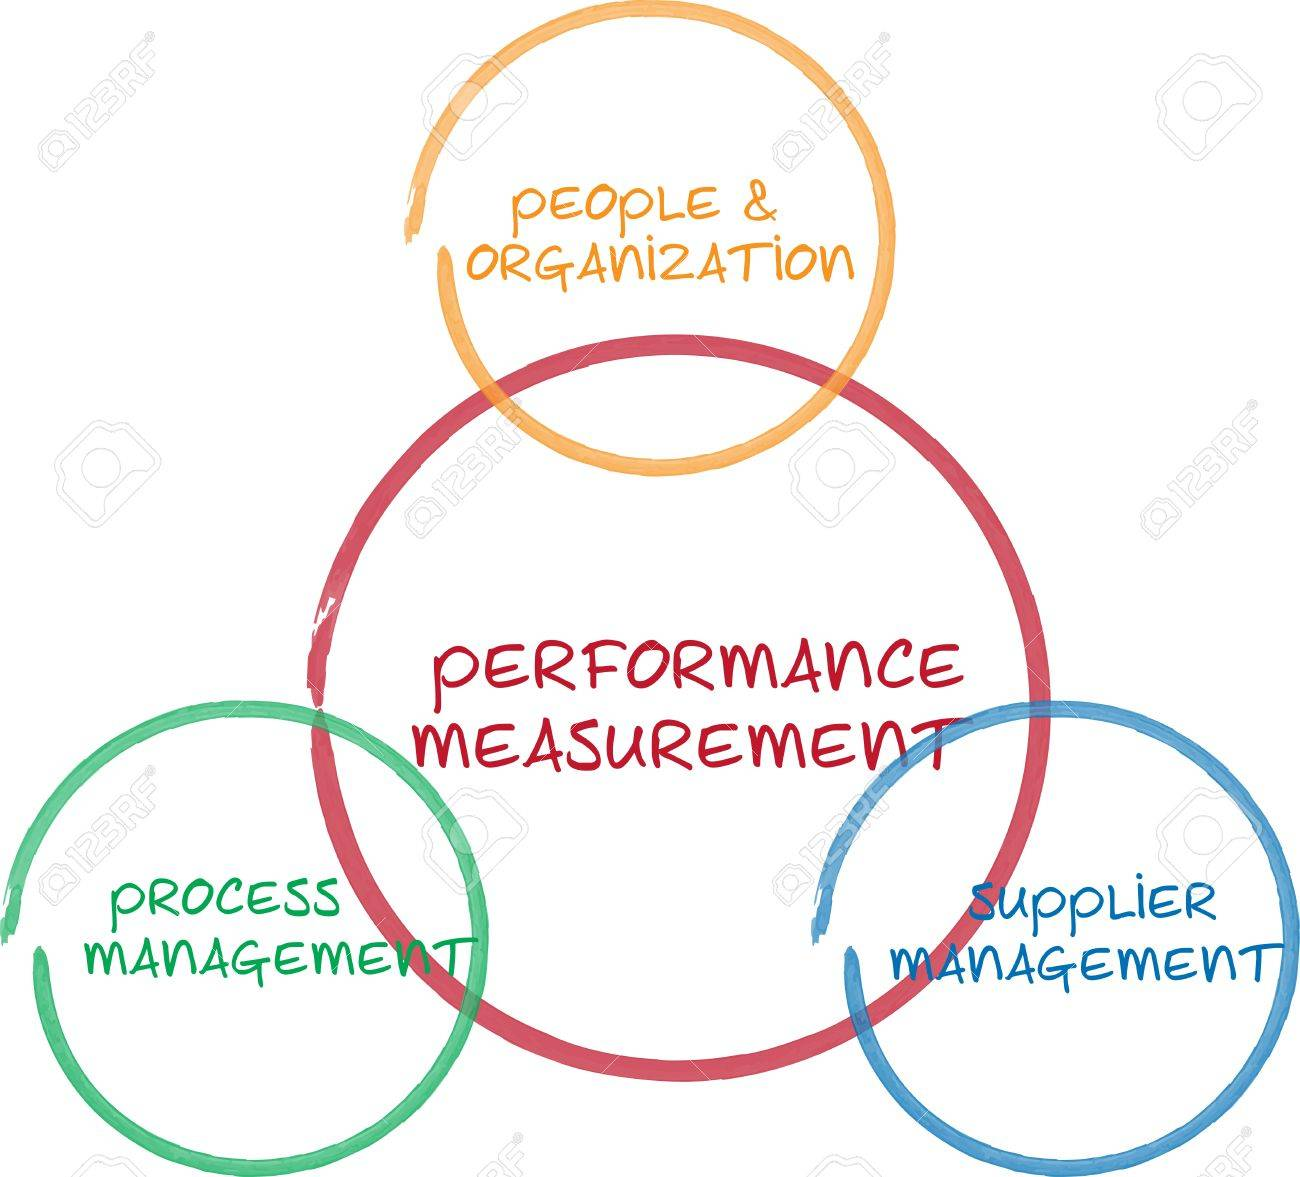 Performance measurement business diagram management strategy whiteboard sketch illustration Stock Illustration - 9416901